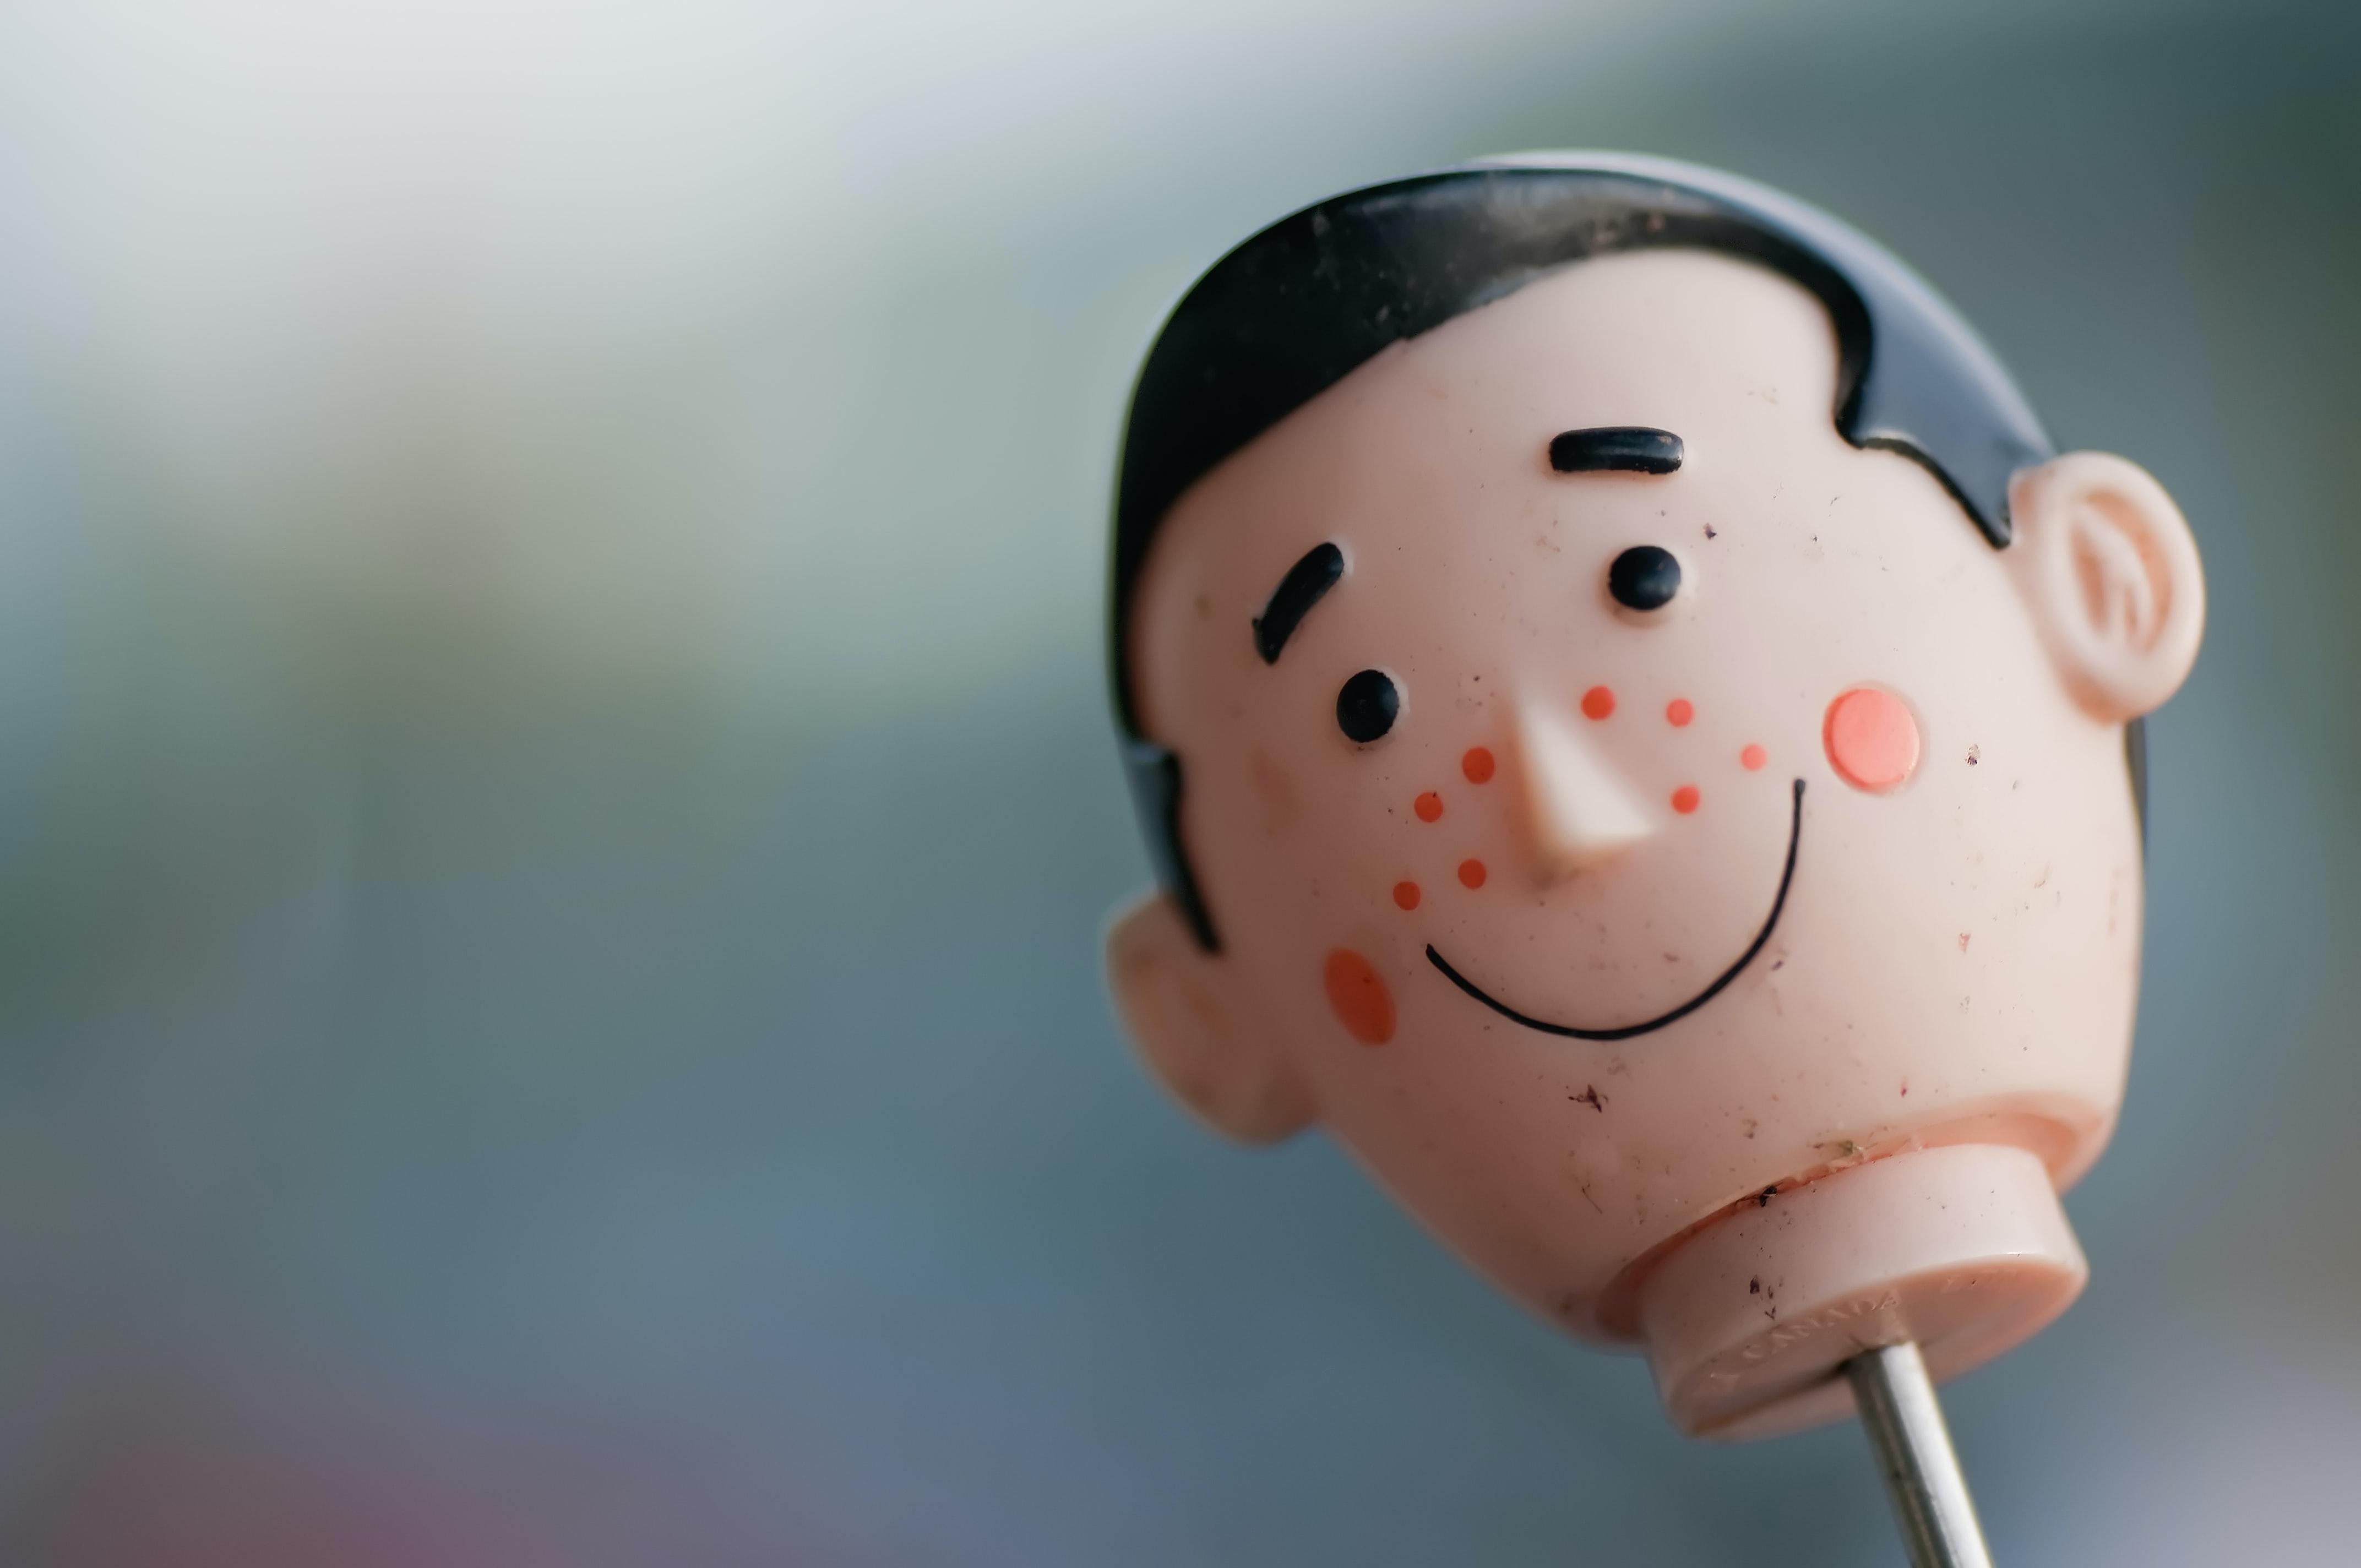 Acne puppet. Photo by Scott Webb on Unsplash.